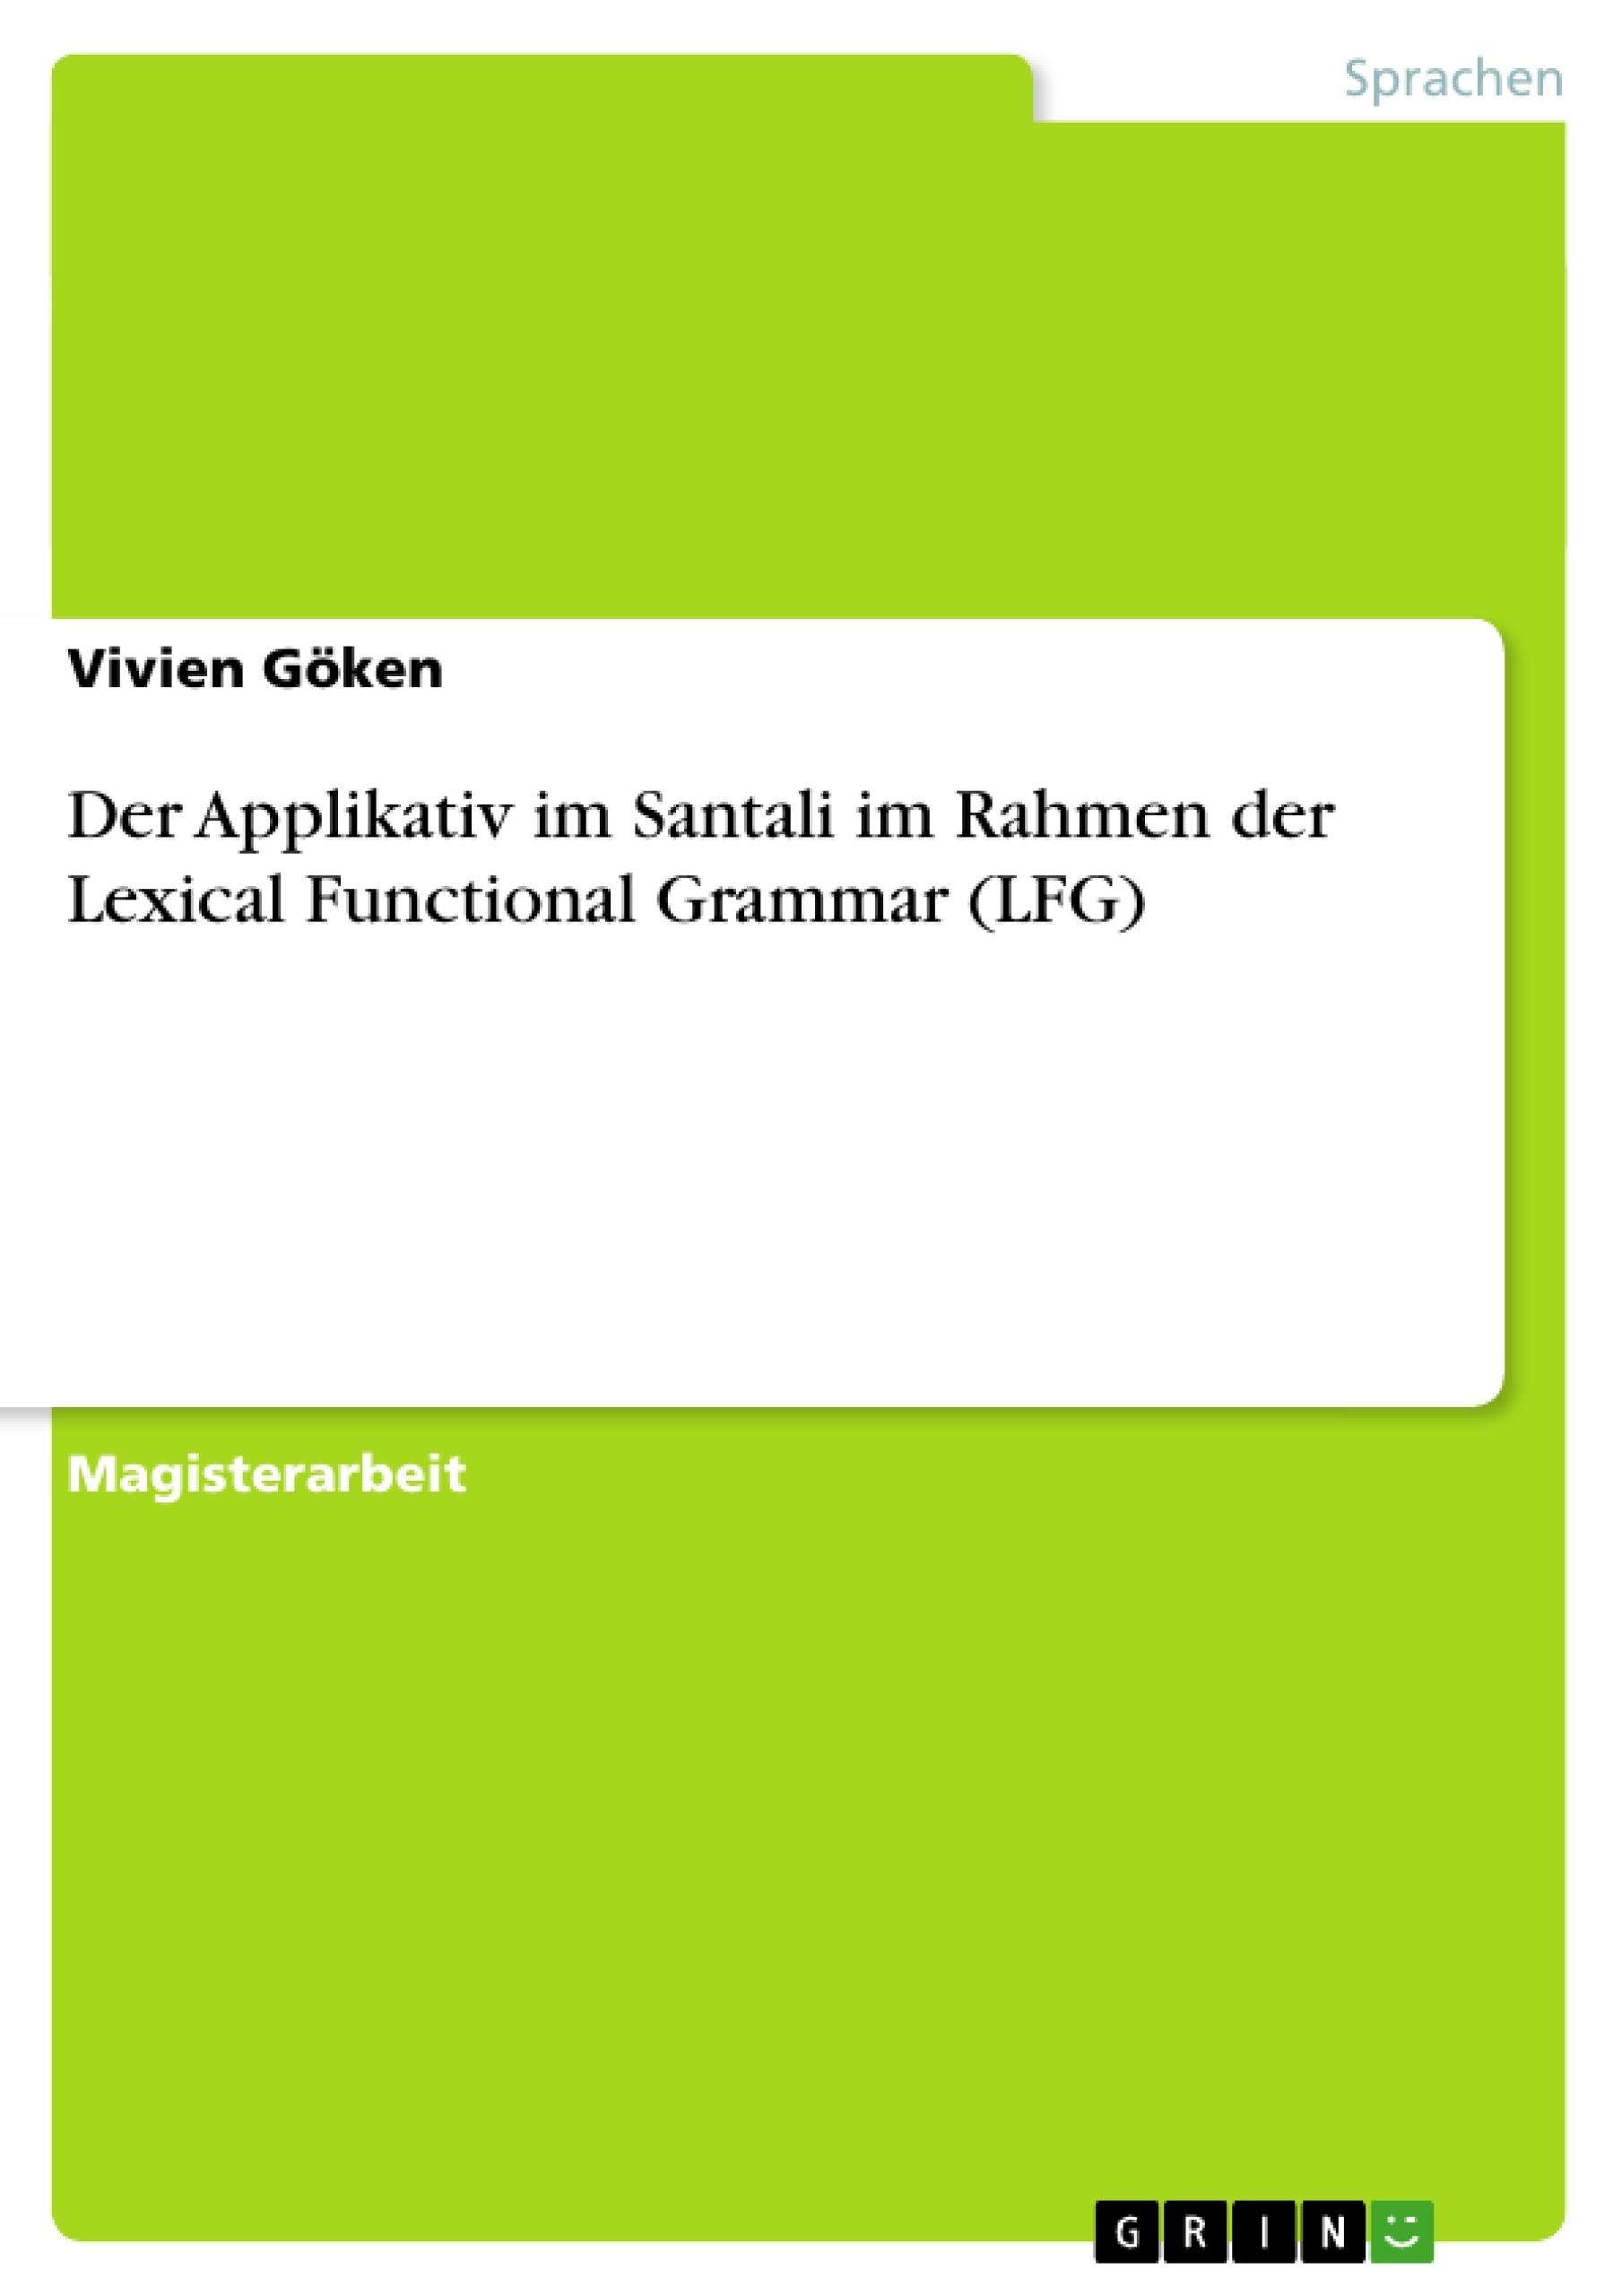 Titel: Der Applikativ im Santali im Rahmen der Lexical Functional Grammar (LFG)